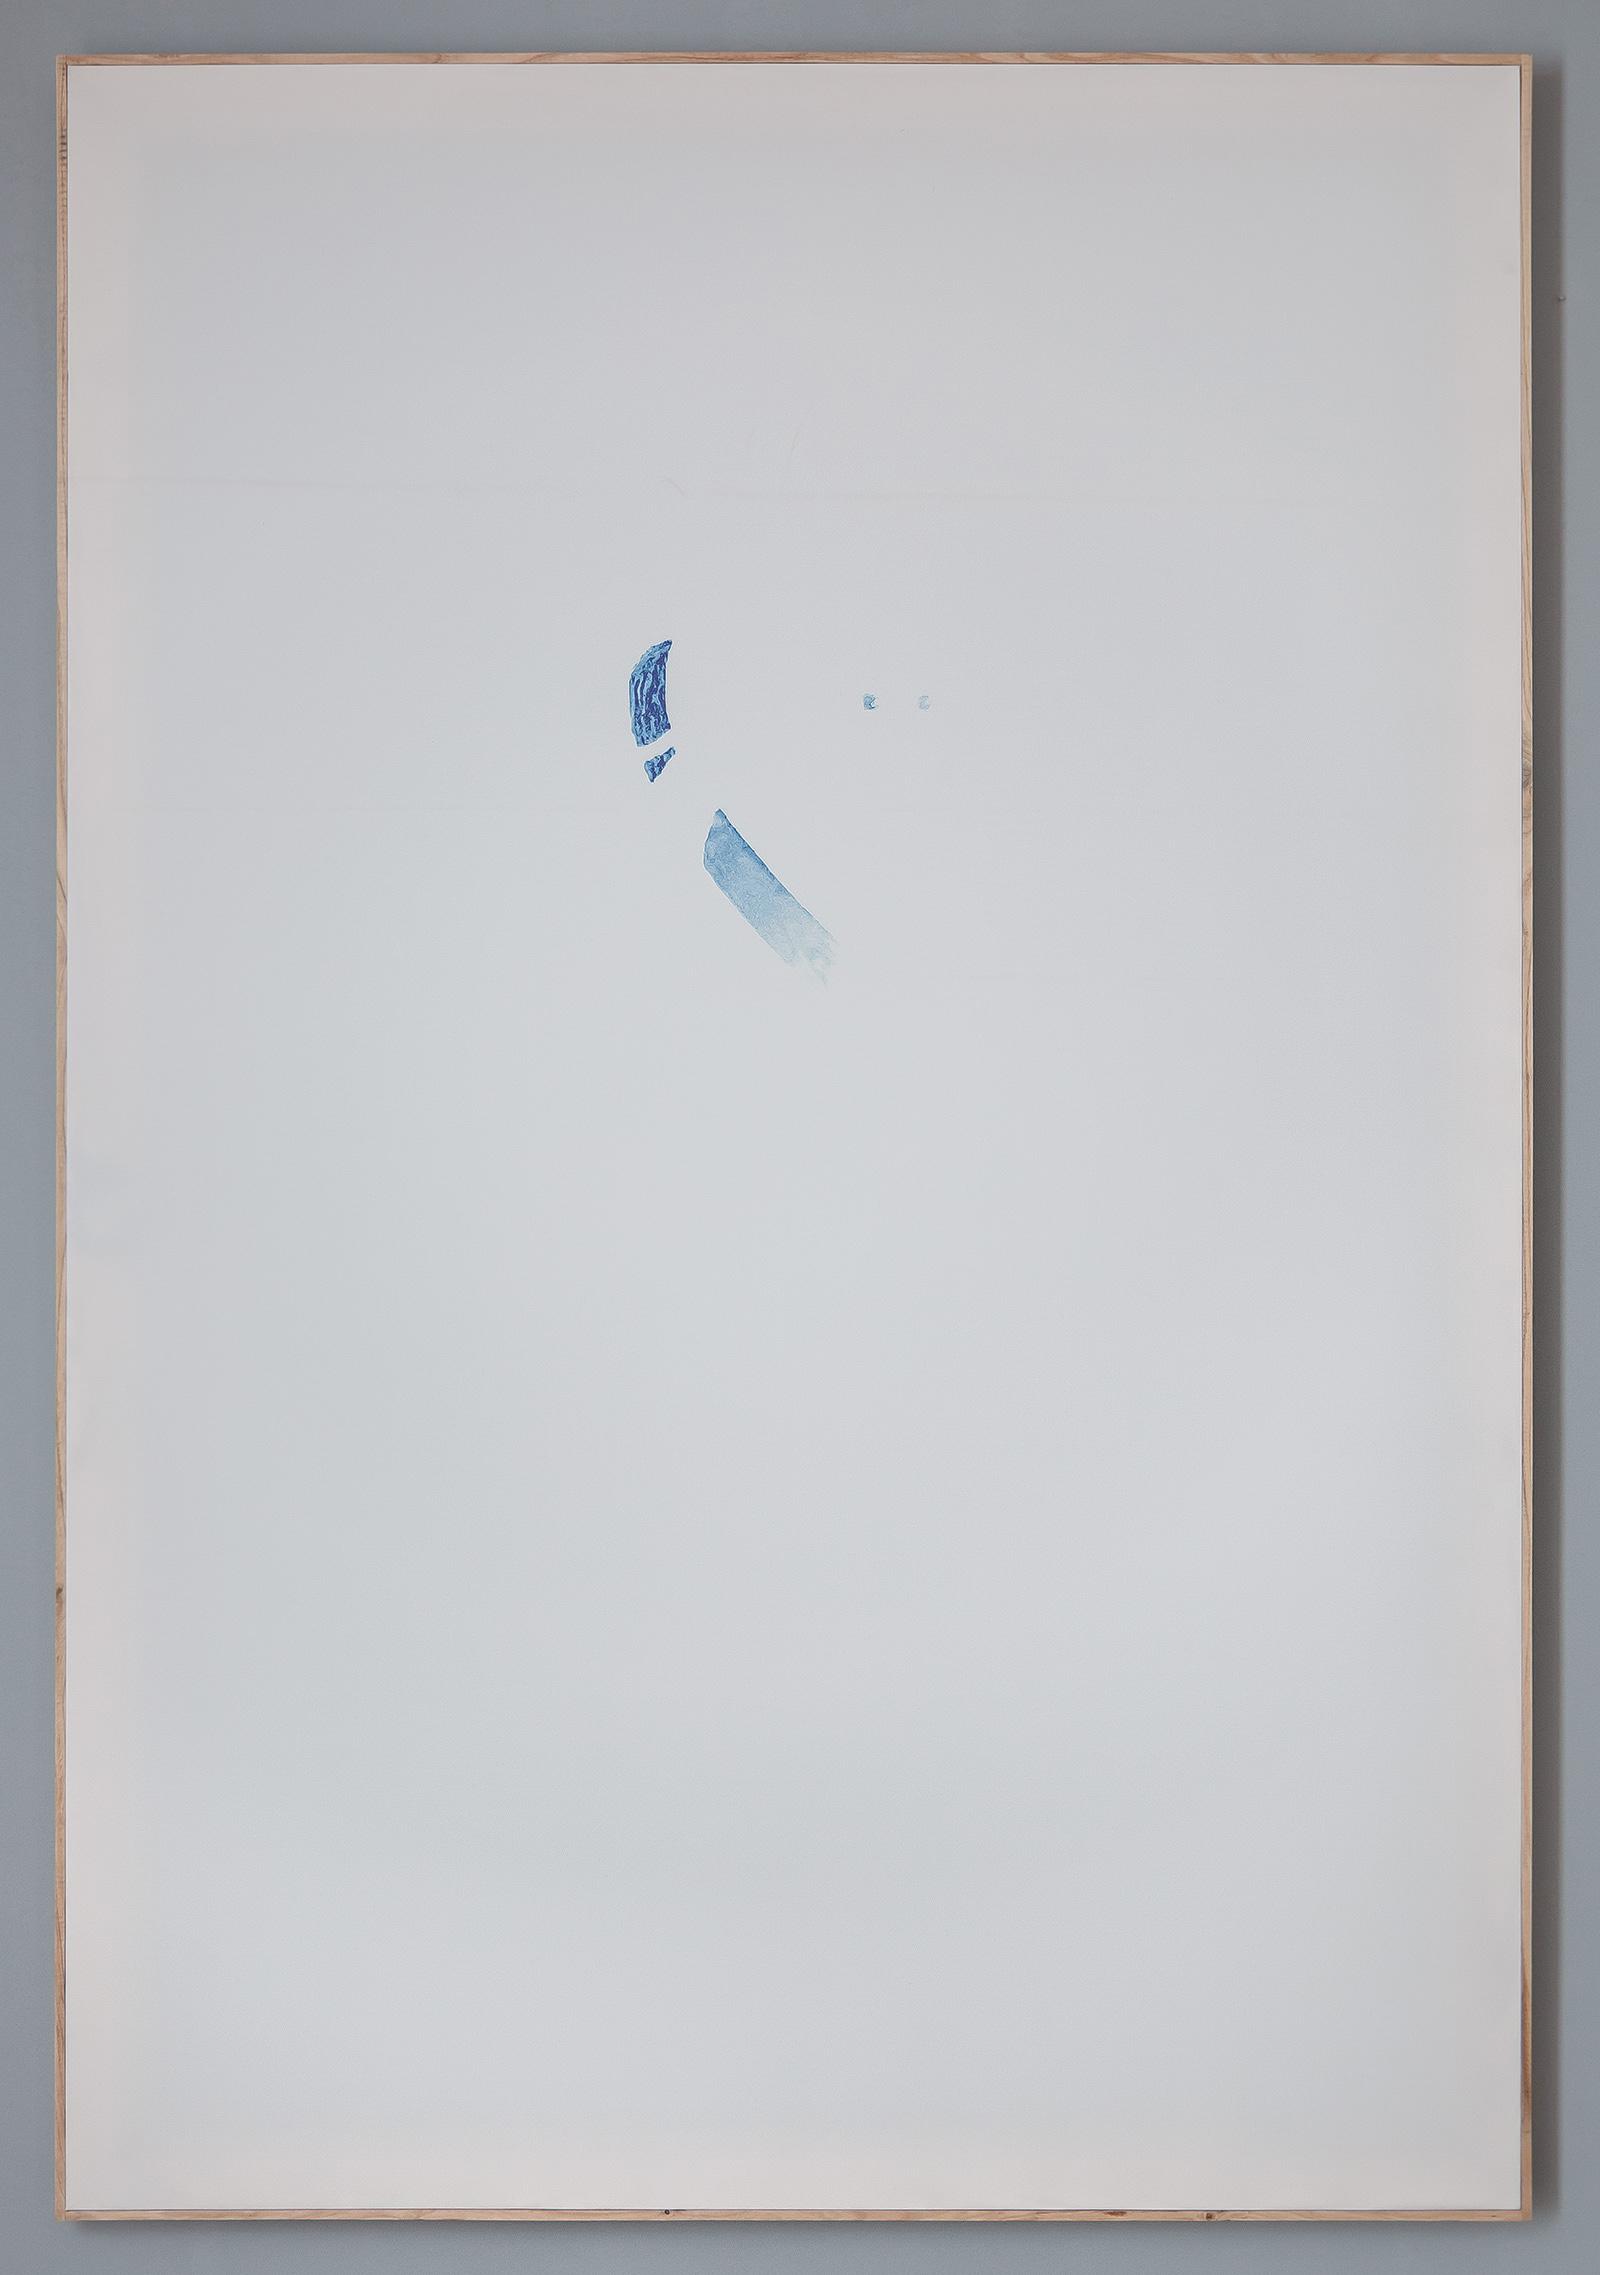 Viron Erol Vert, Crossdresser, 2014